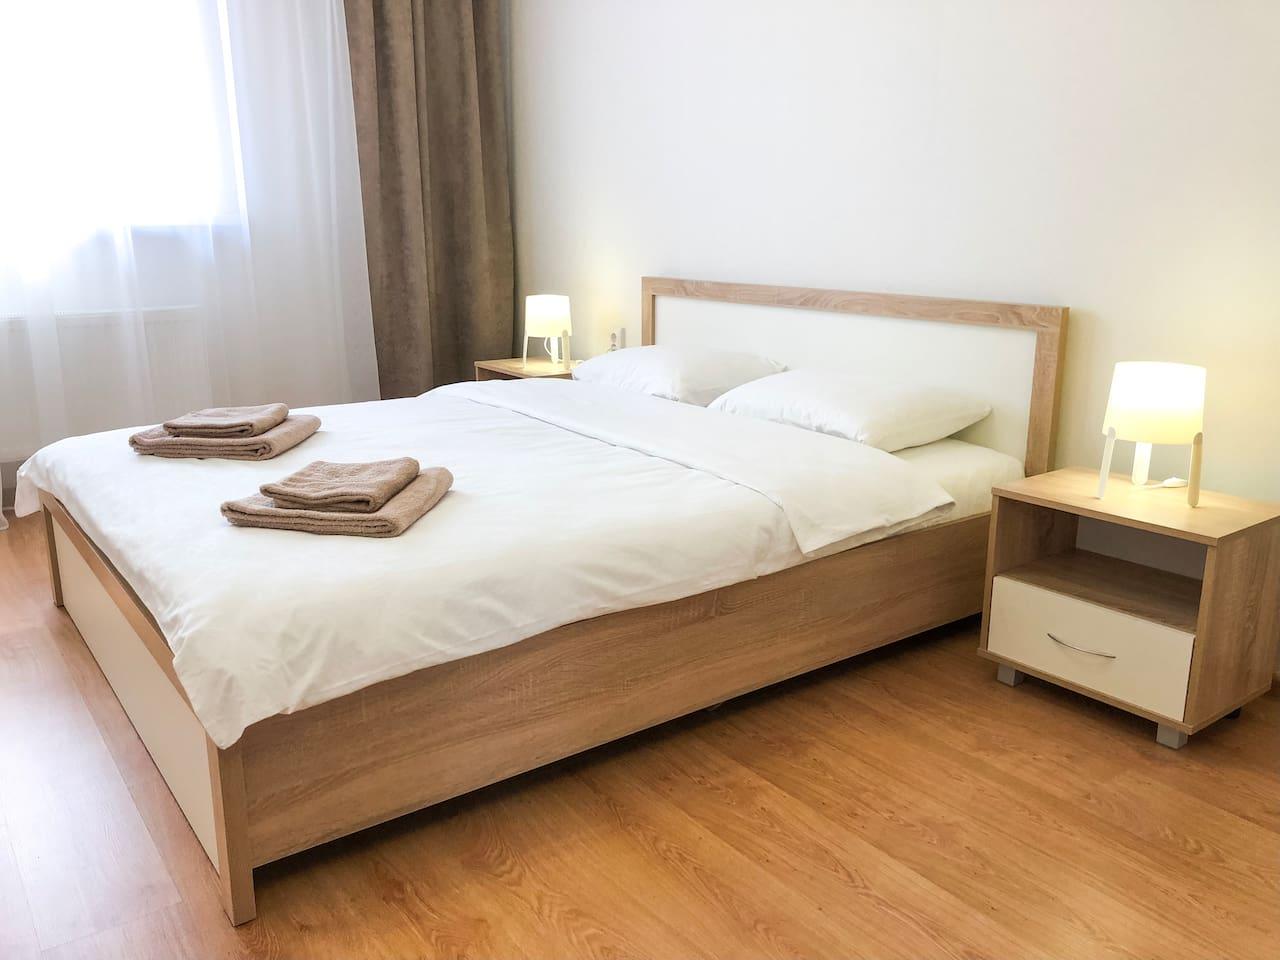 Двуспальная кровать King Size в спальне/Double King Size Bed in the bedroom